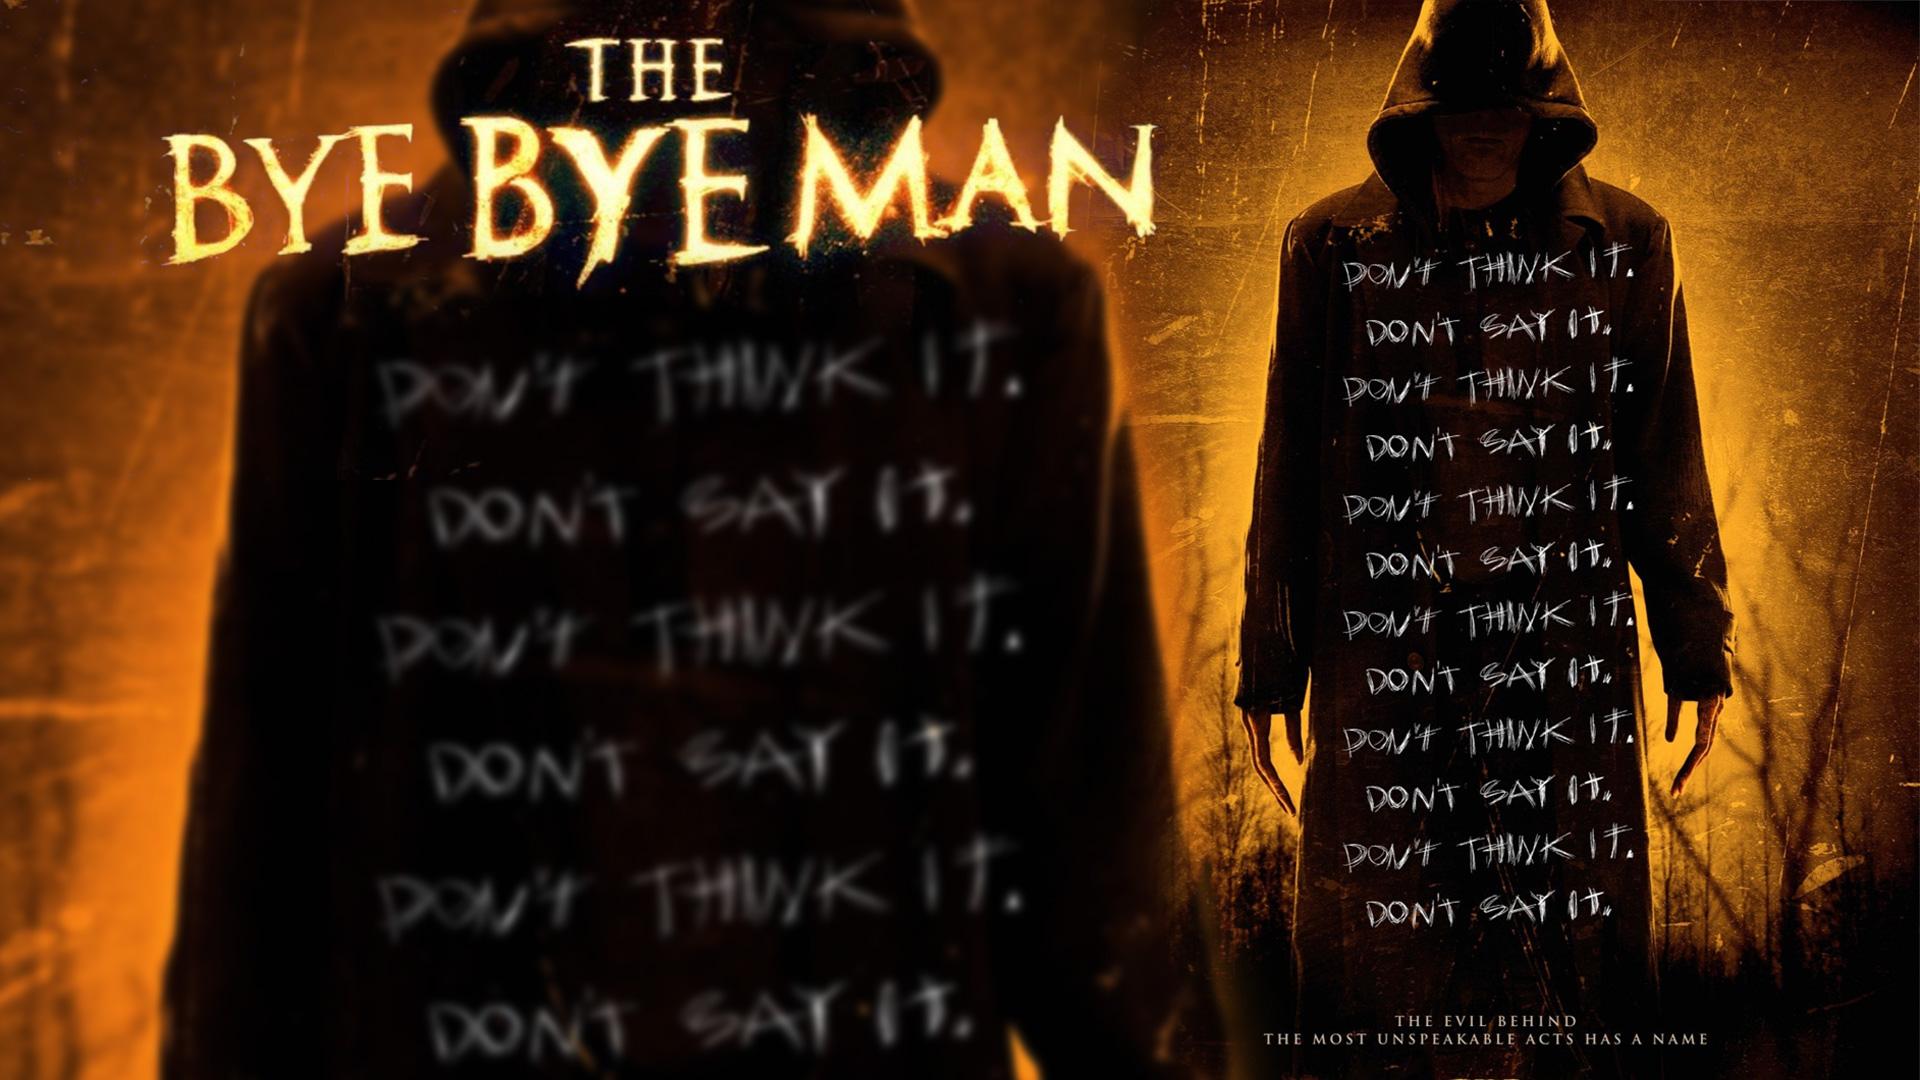 the-bye-bye-man-movie-wallpaper-hd-film-2016-poster-image